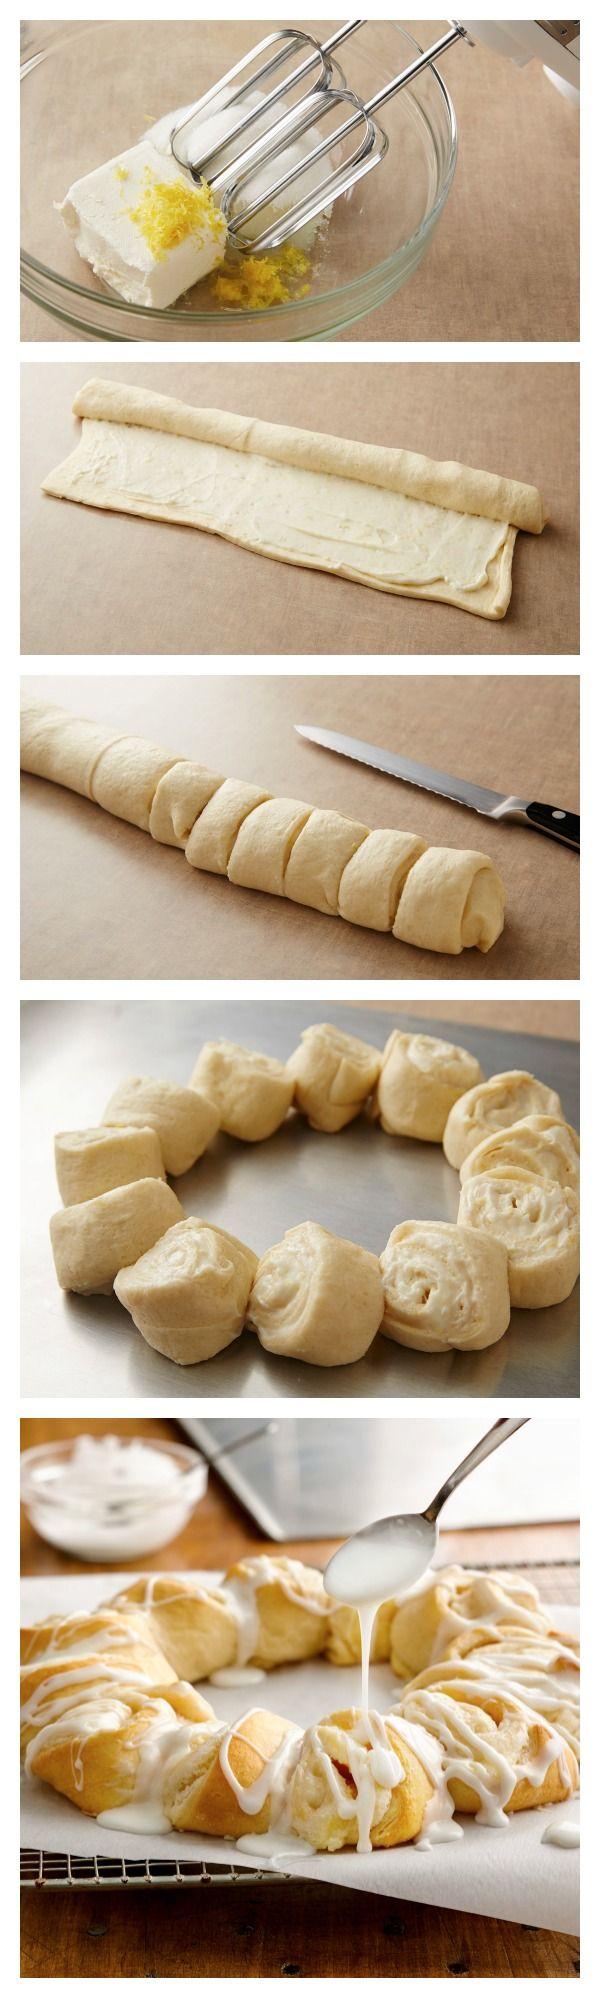 Lemon+ cream cheese + crescents = best brunch ring ever.